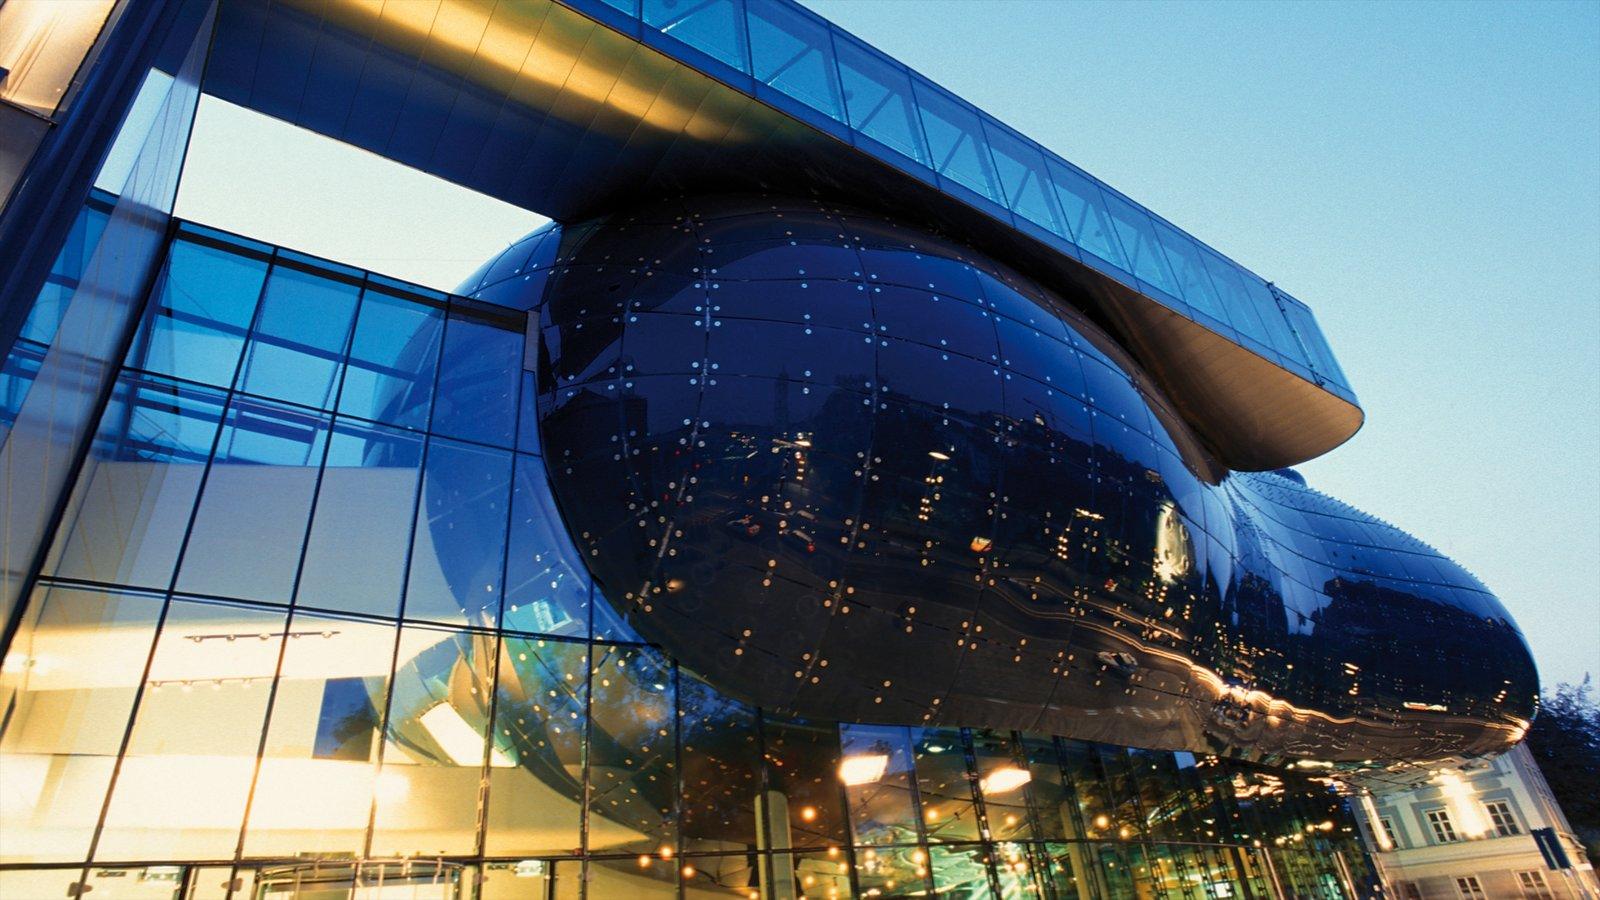 Museo de arte de Graz que incluye arquitectura moderna